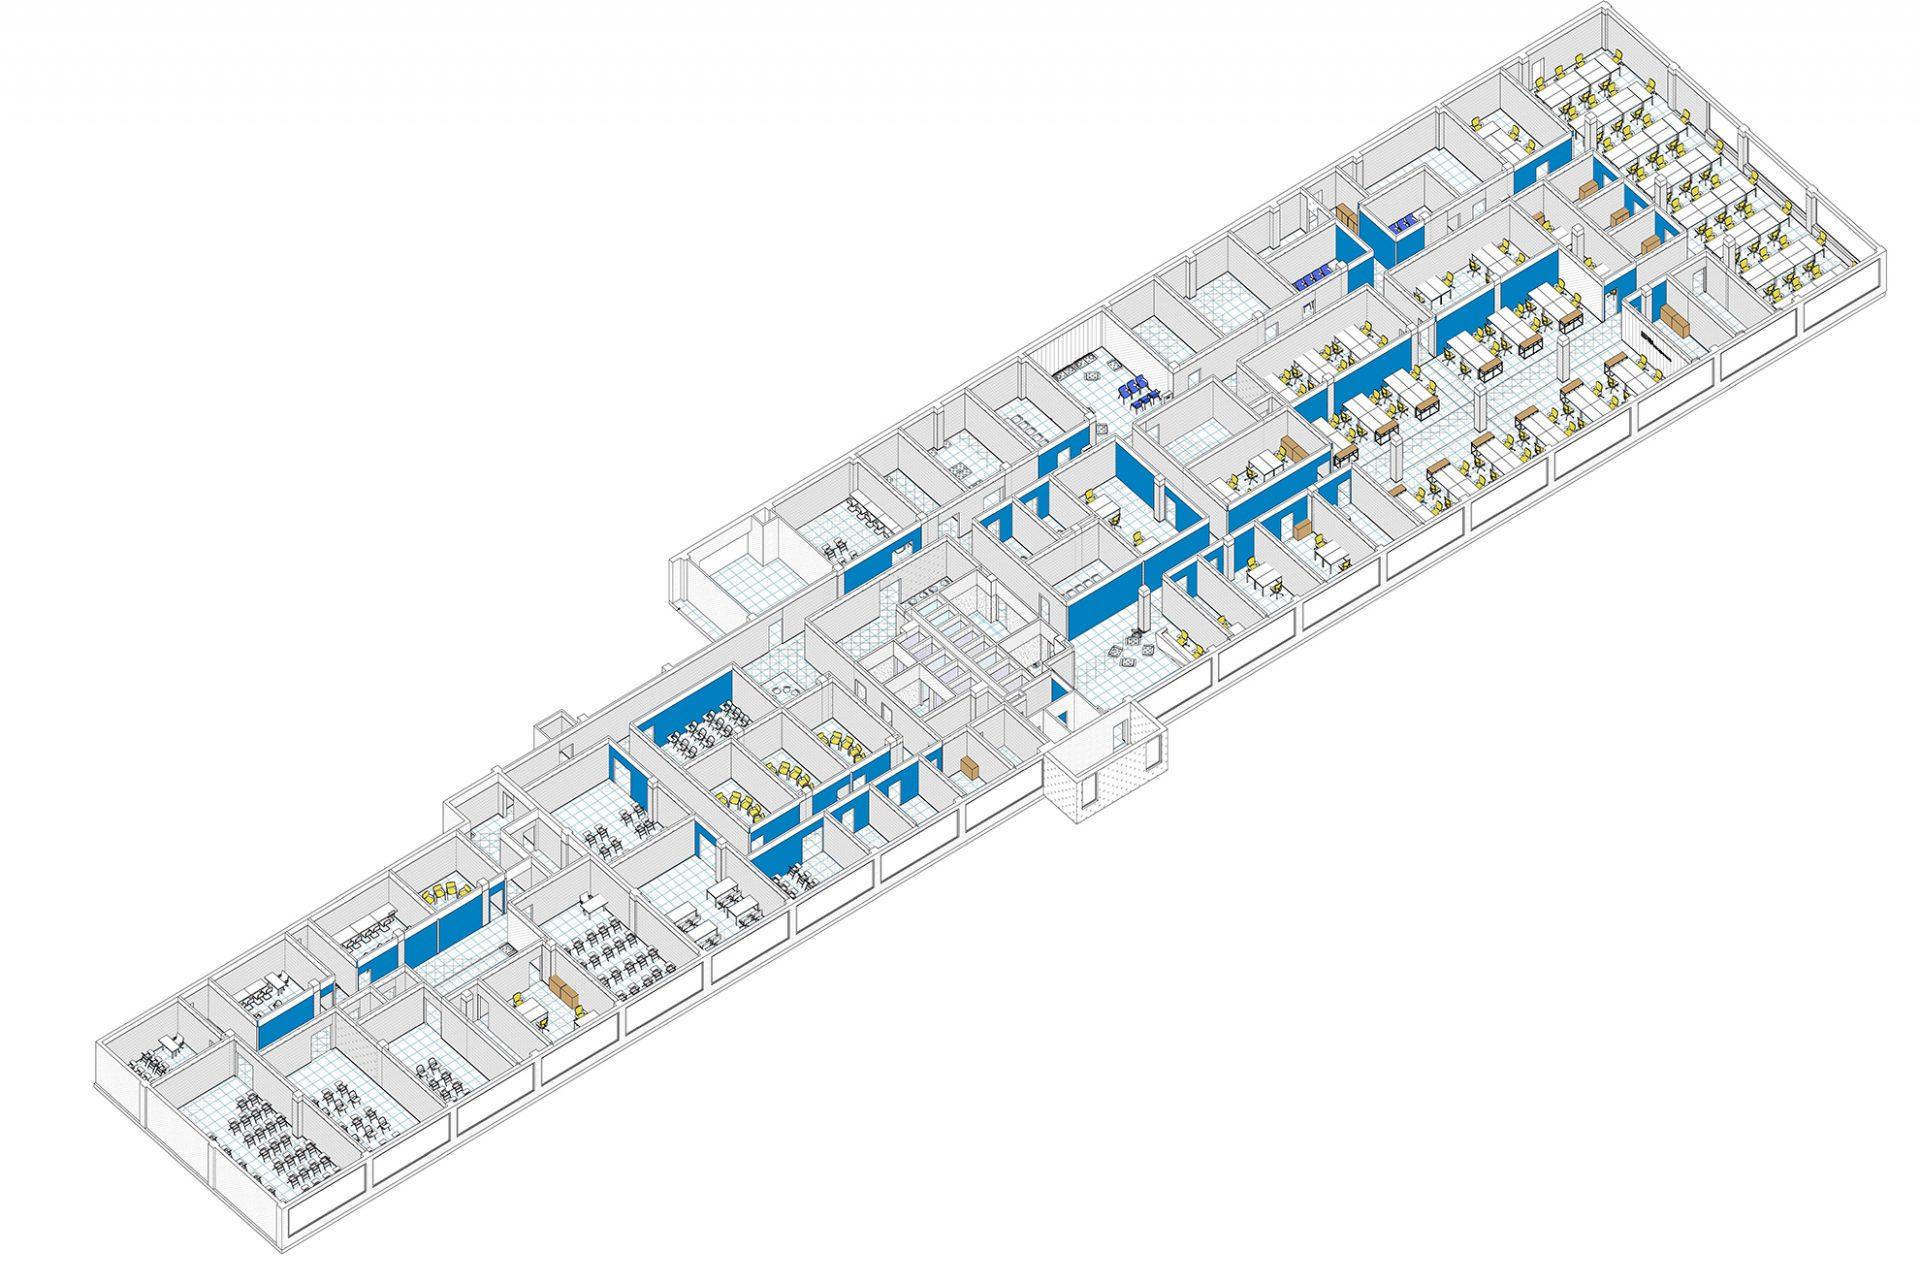 3д модель офиса авиакомпании Победа от бюро Снег